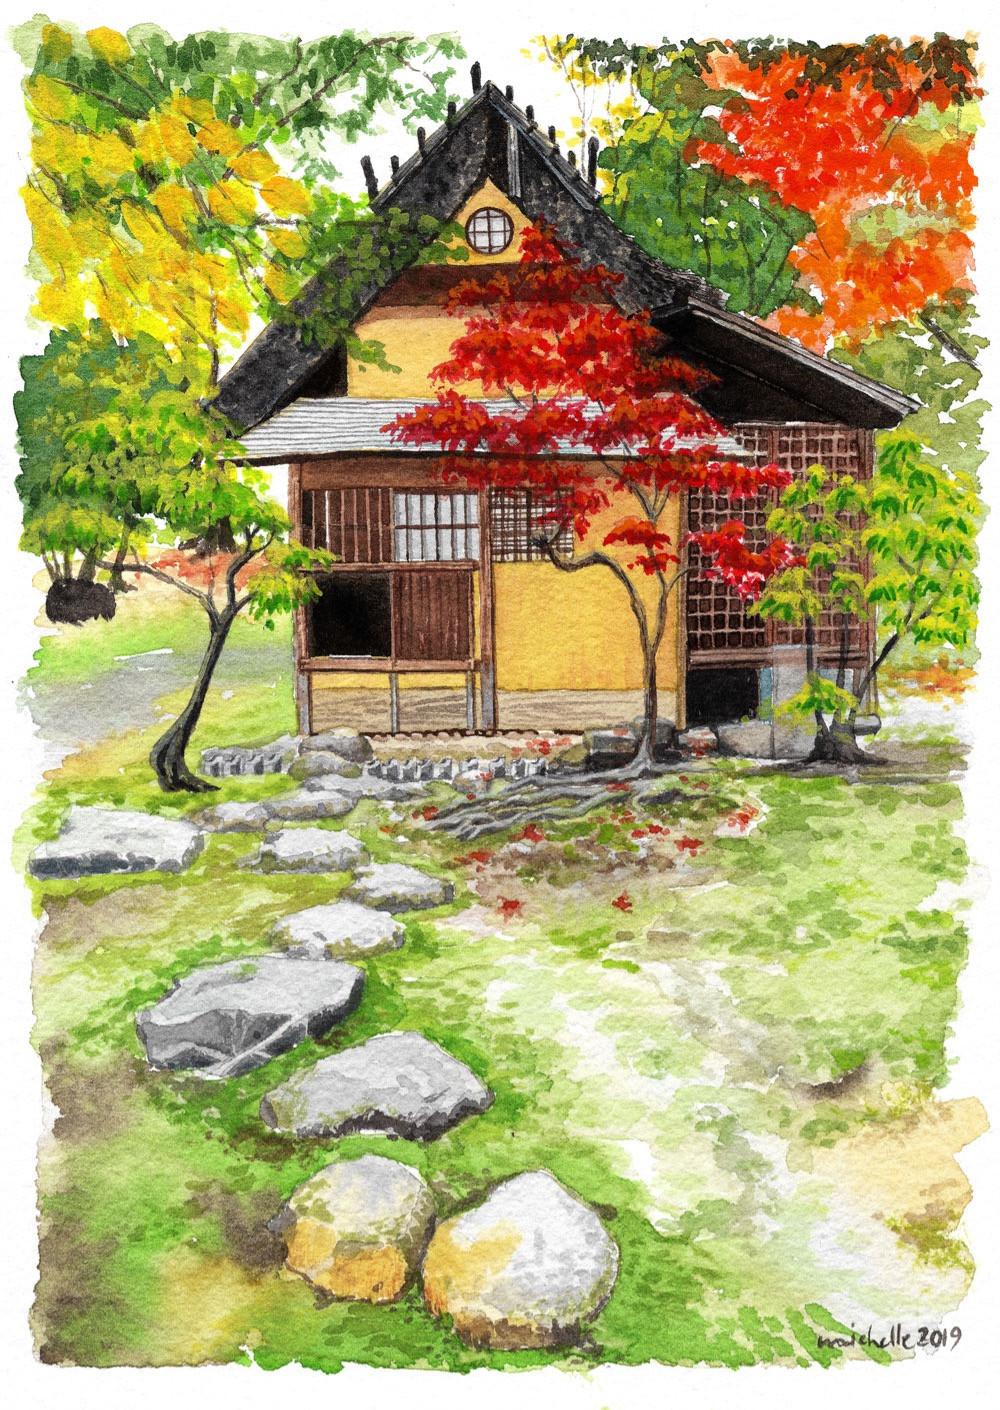 A teahouse in autumn